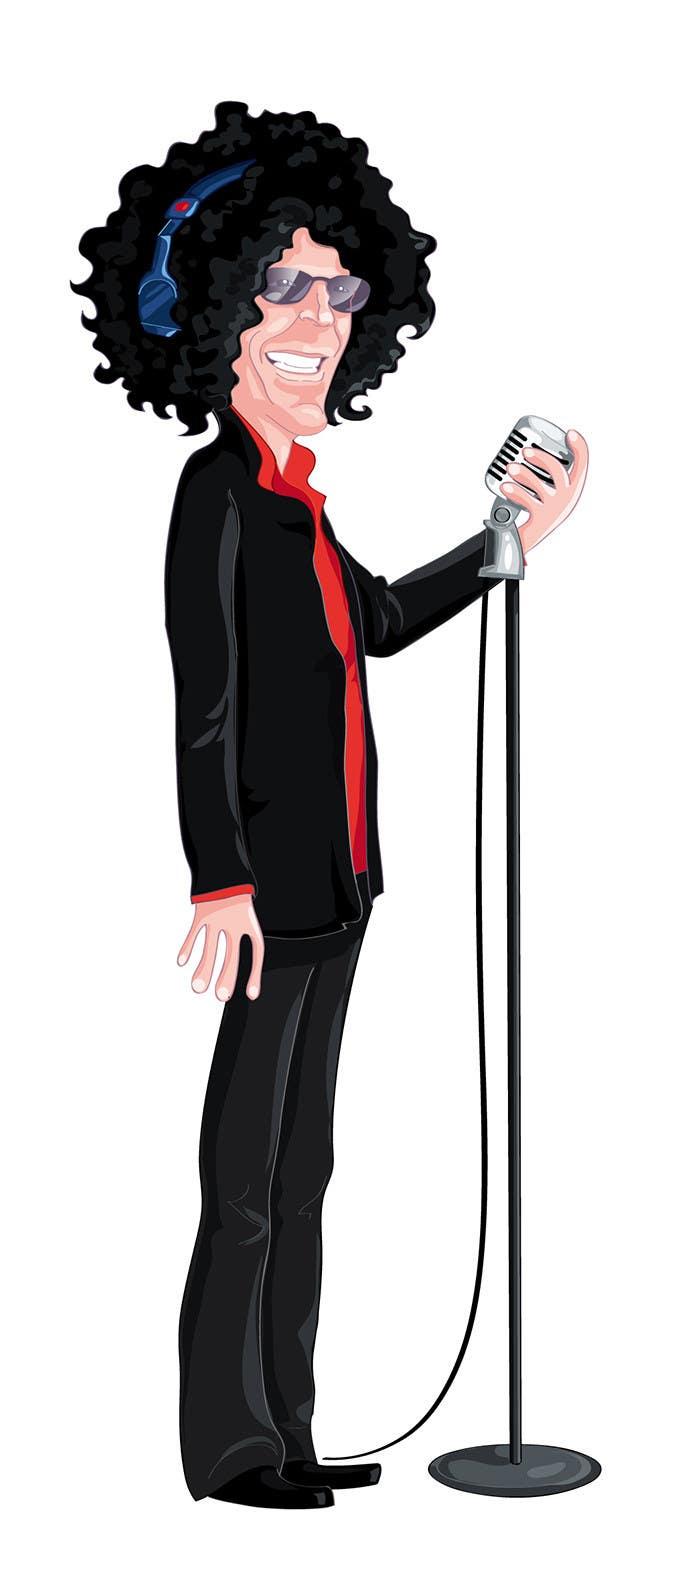 Penyertaan Peraduan #25 untuk Cartoon for The Howard Stern Show